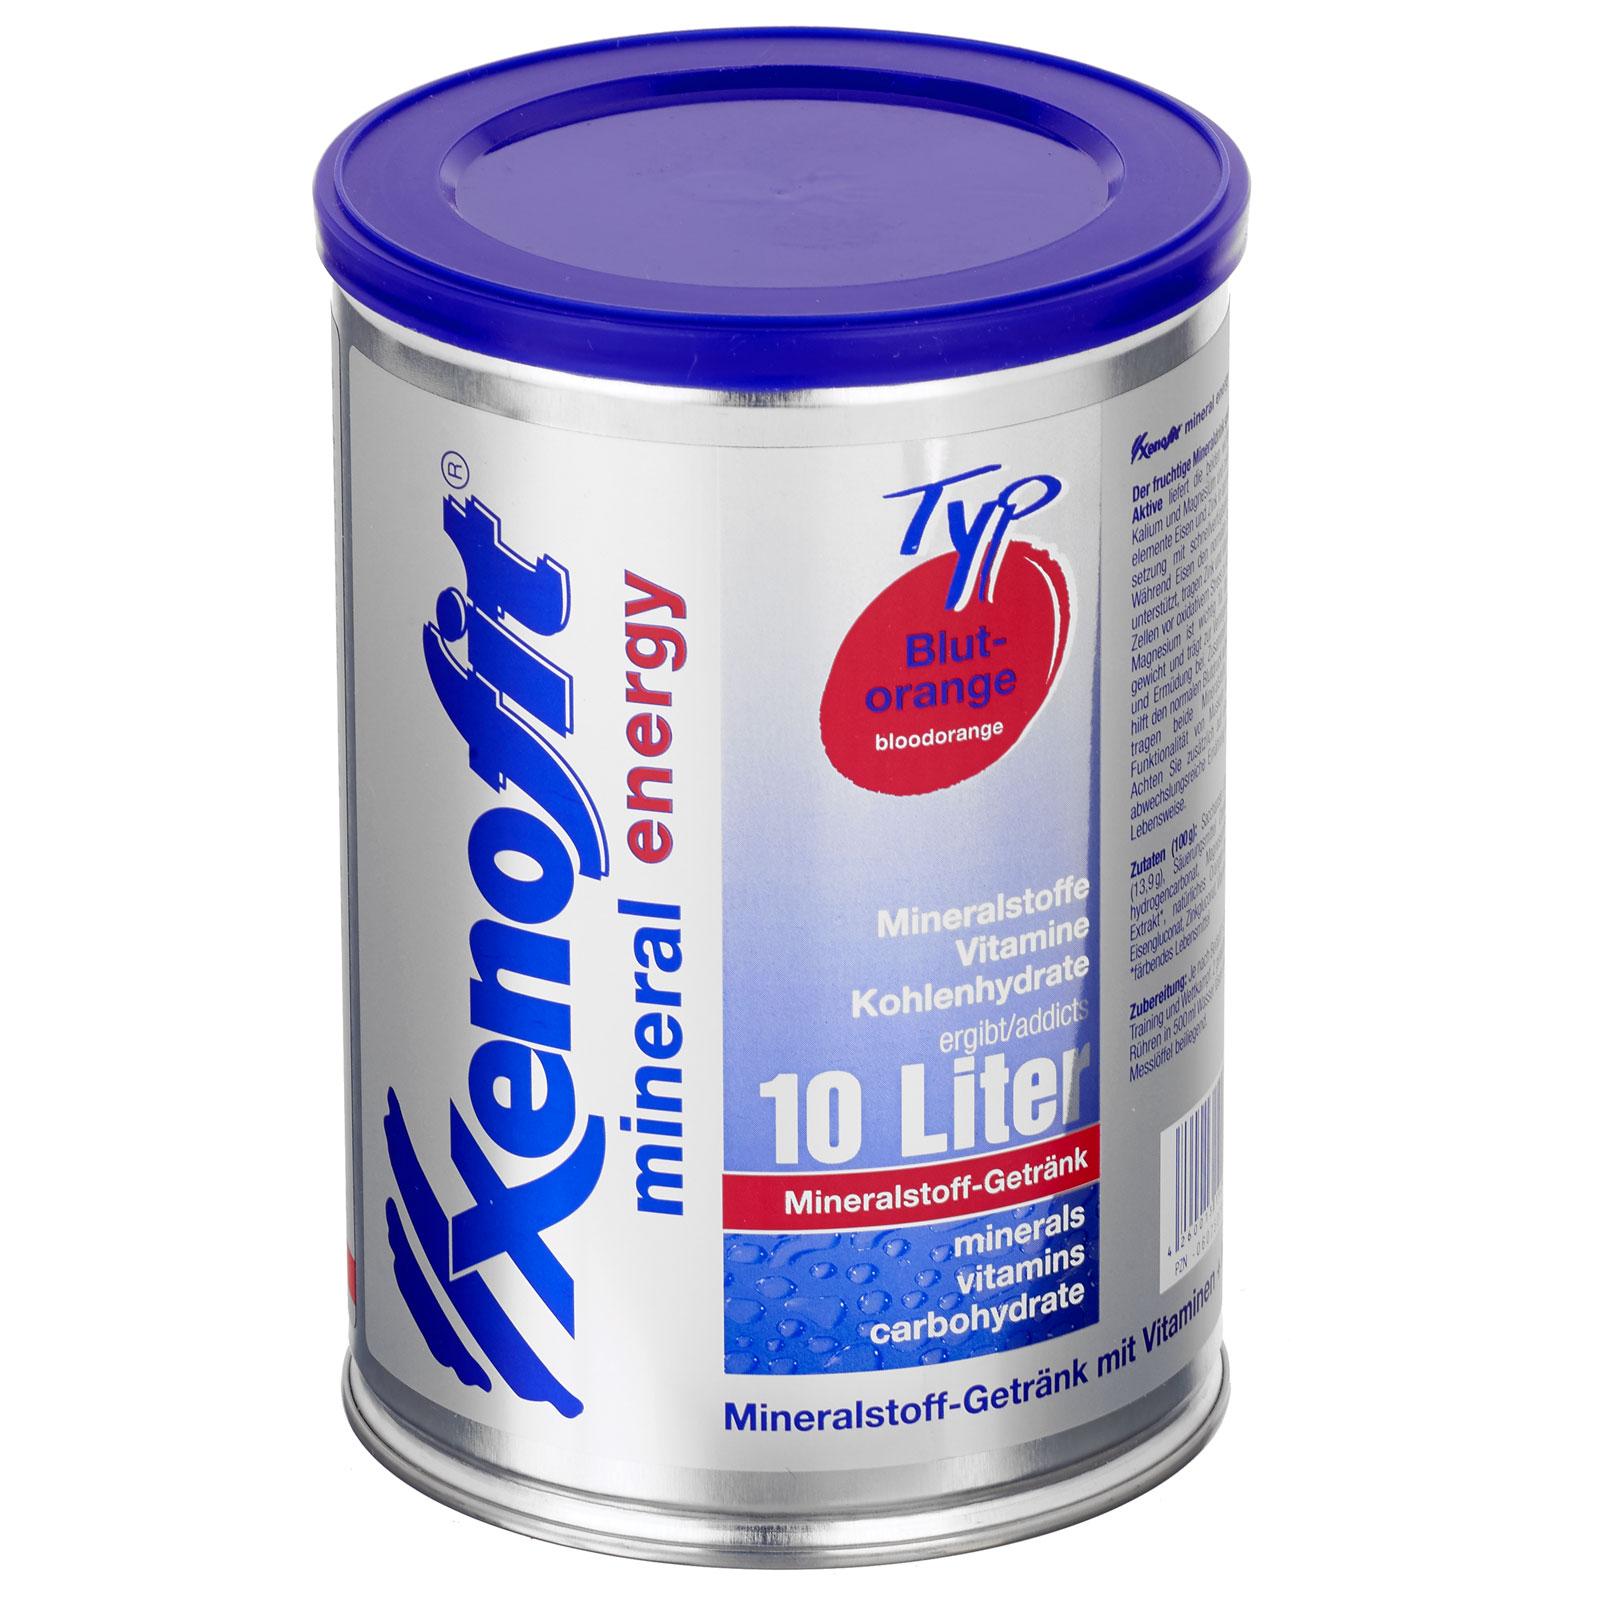 Xenofit Mineral Energy Drink mit Kohlenhydraten - 720g